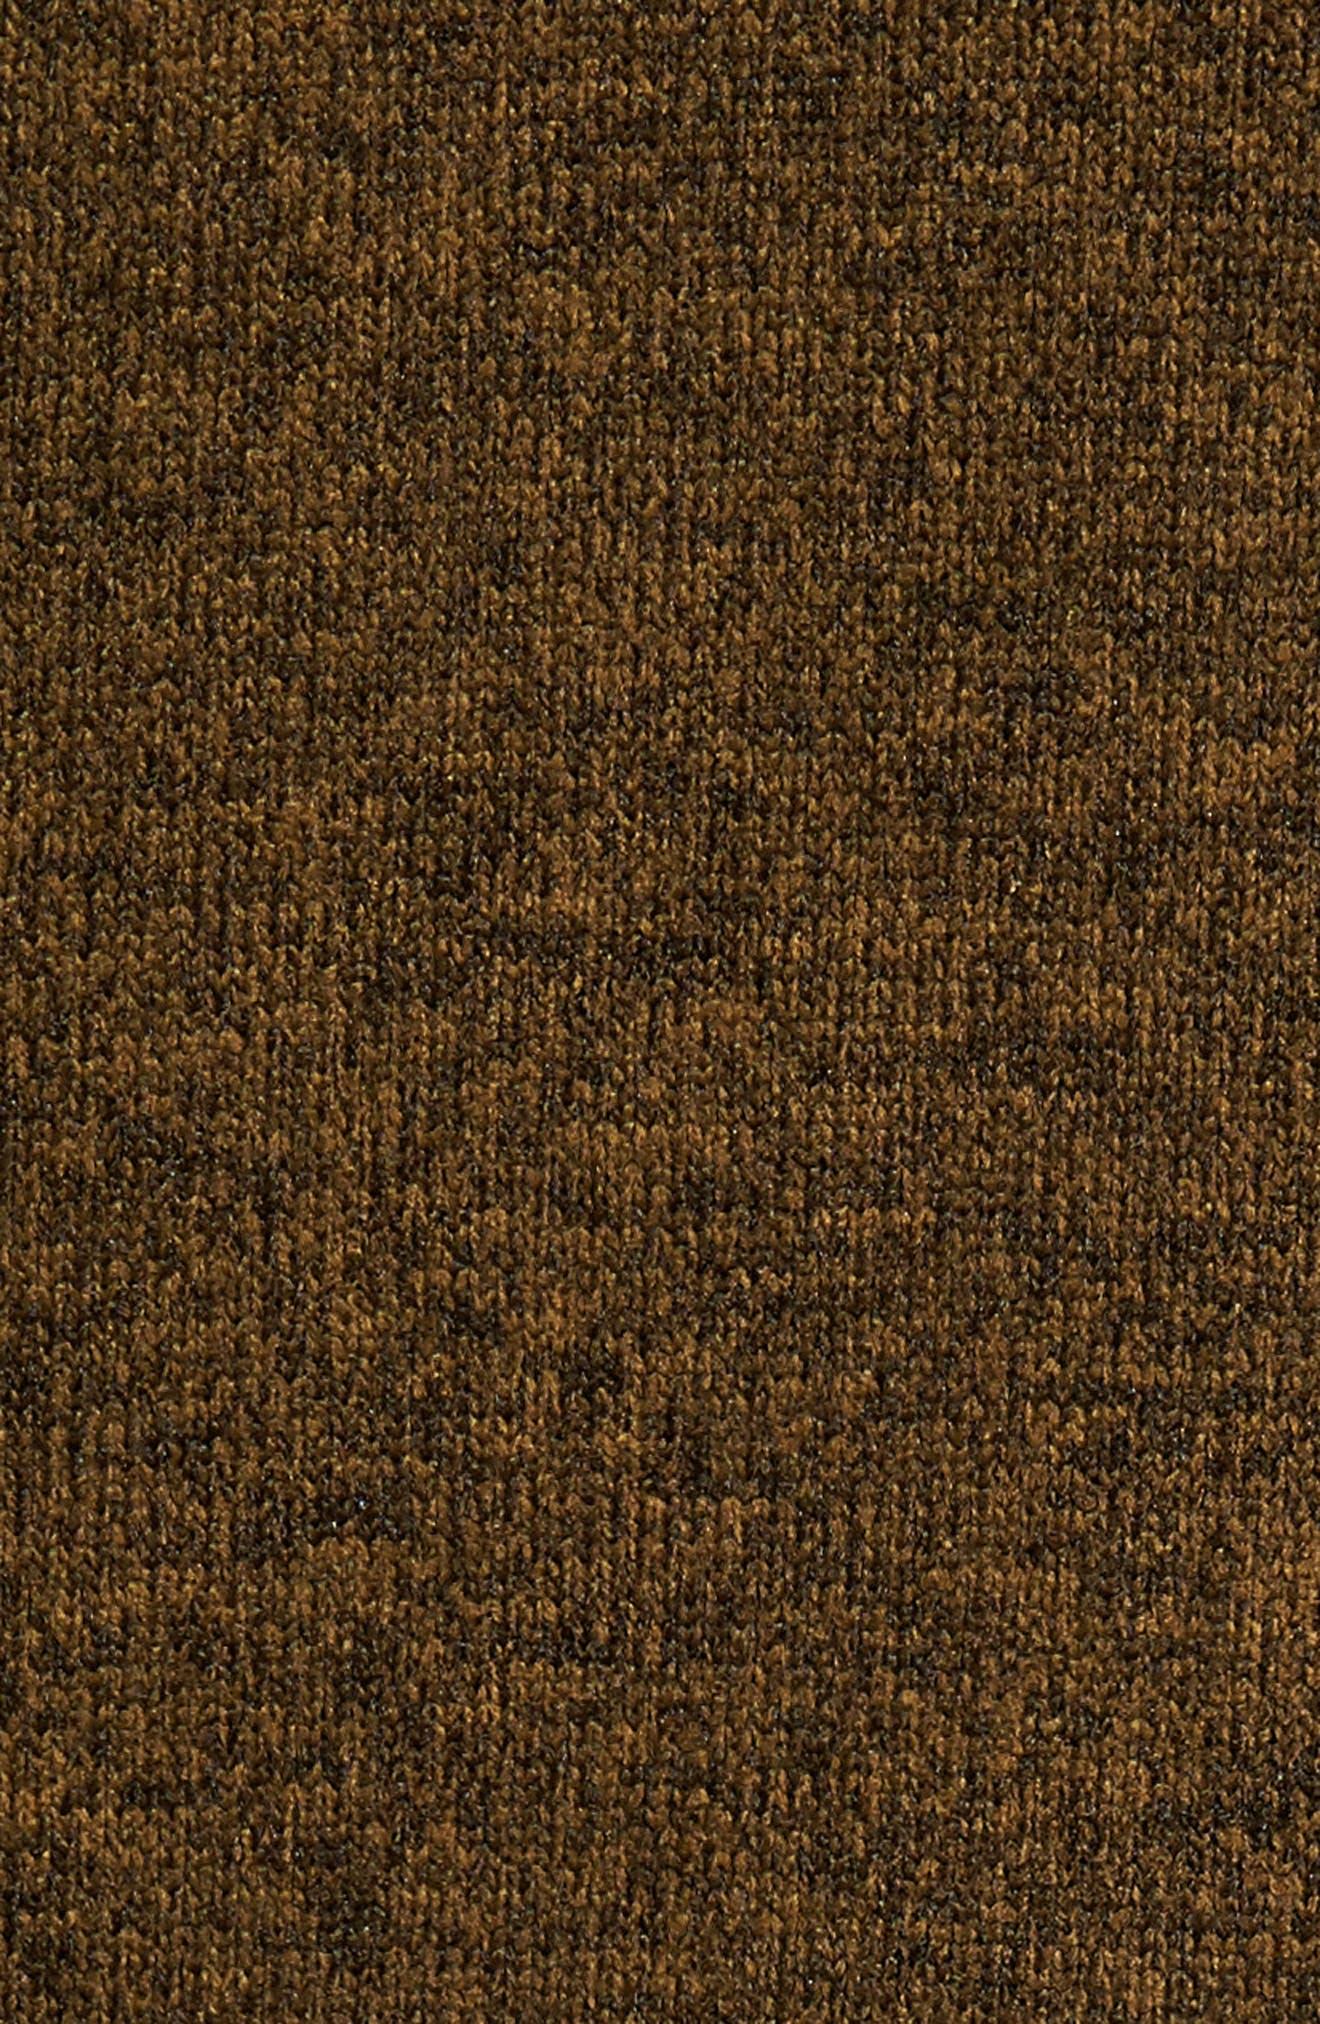 Sweater Knit Fleece Zip Front Jacket,                             Alternate thumbnail 14, color,